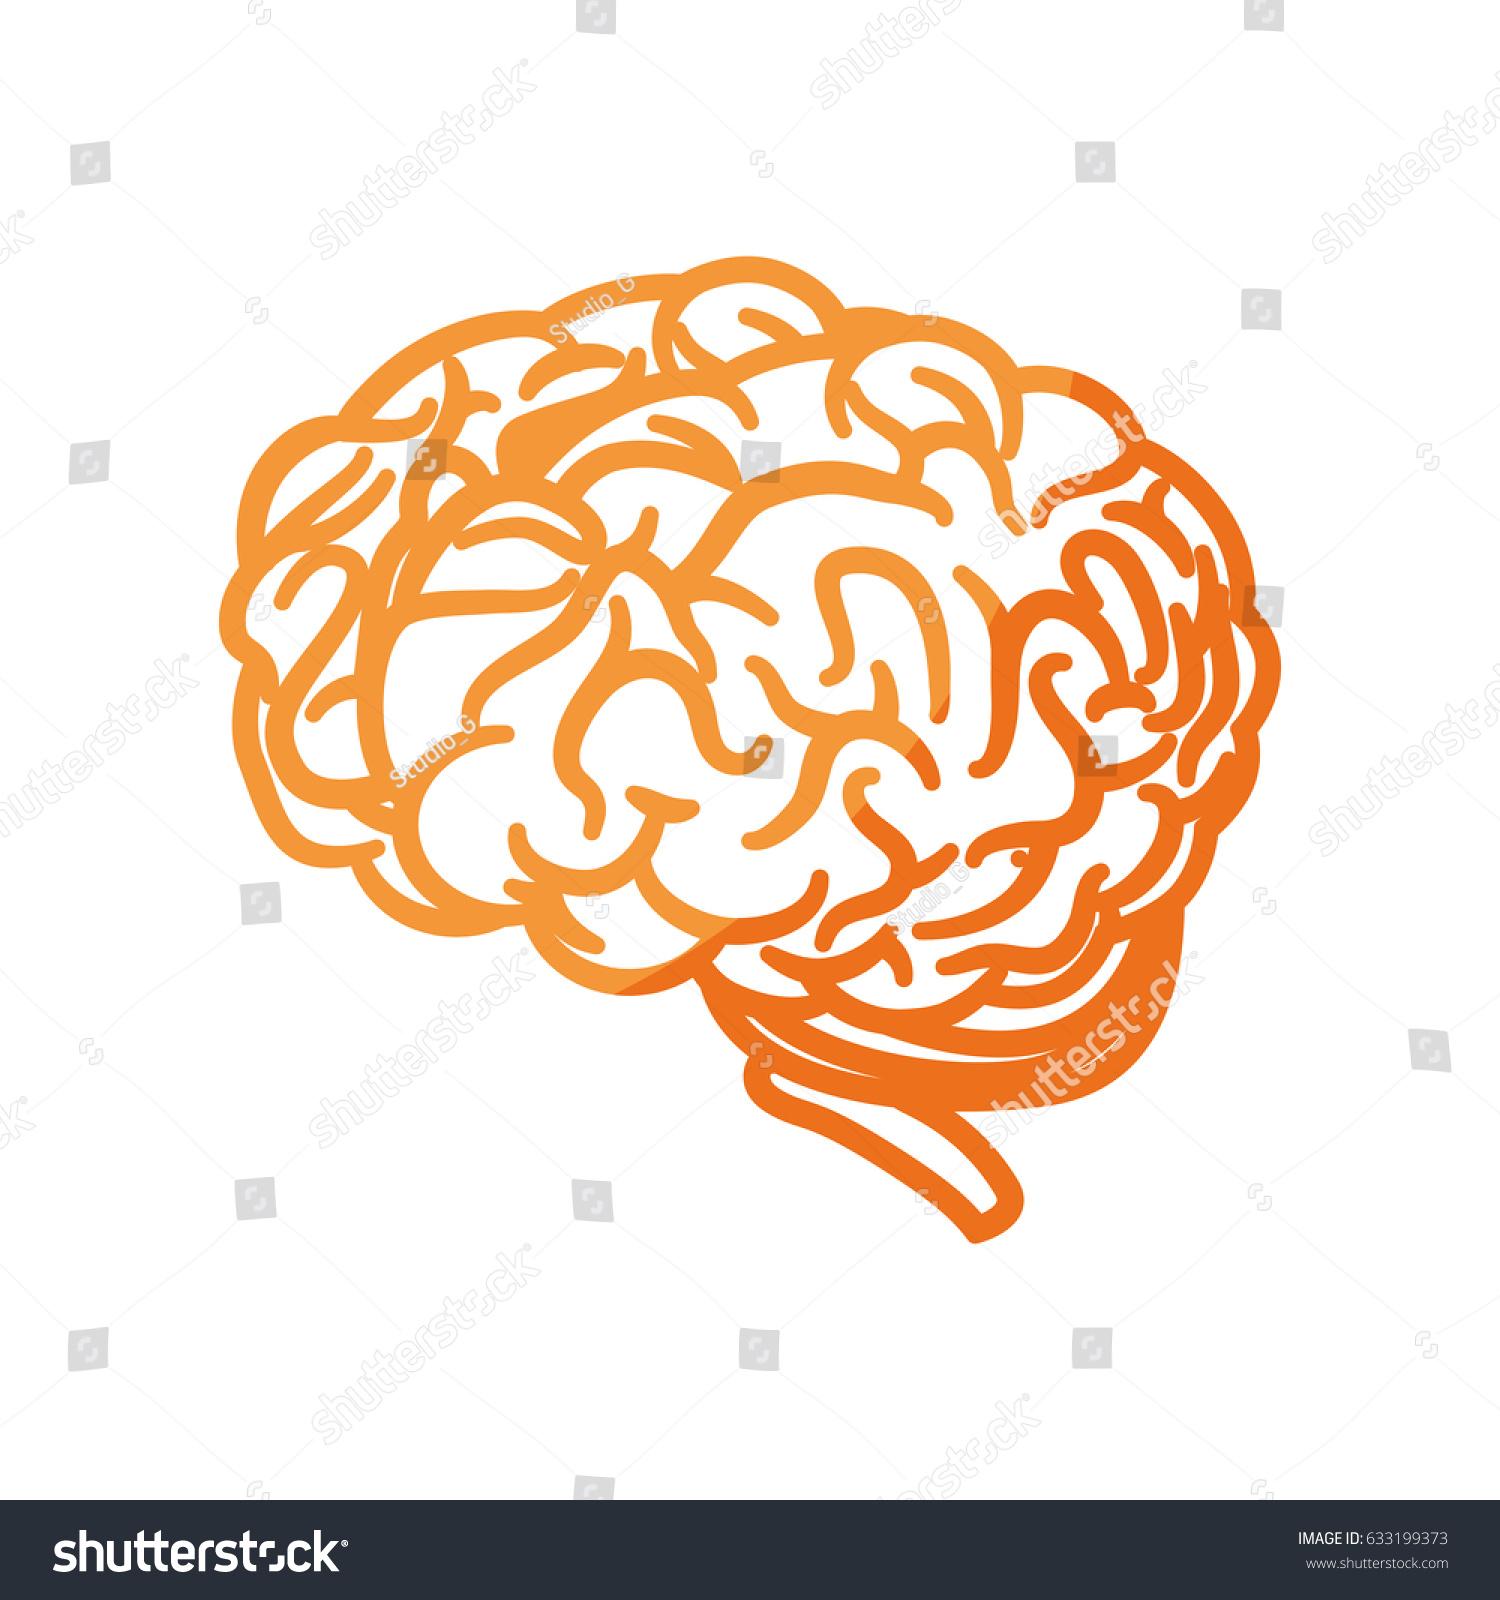 Human brain symbol stock vector 633199373 shutterstock human brain symbol biocorpaavc Images